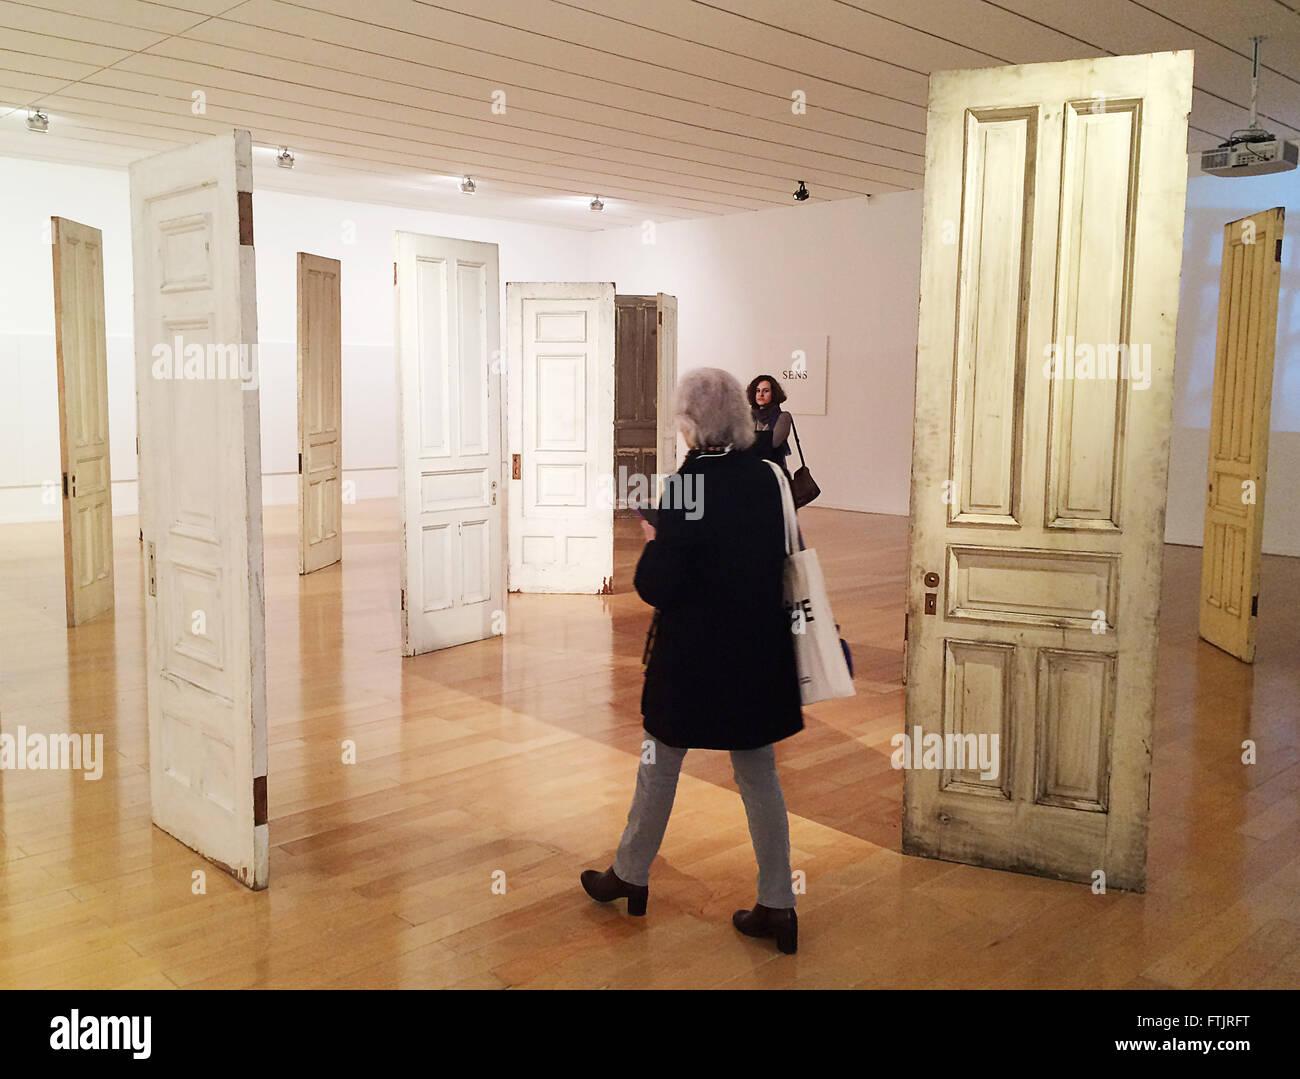 The installation u0027Doorsu0027 by artist Yoko Ono is on display at the art museum in Lyon France 08 March 2016. The retrospective u0027Lumiere de lu0027aubeu0027 & Lyon France. 08th Mar 2016. The installation u0027Doorsu0027 by artist ... pezcame.com